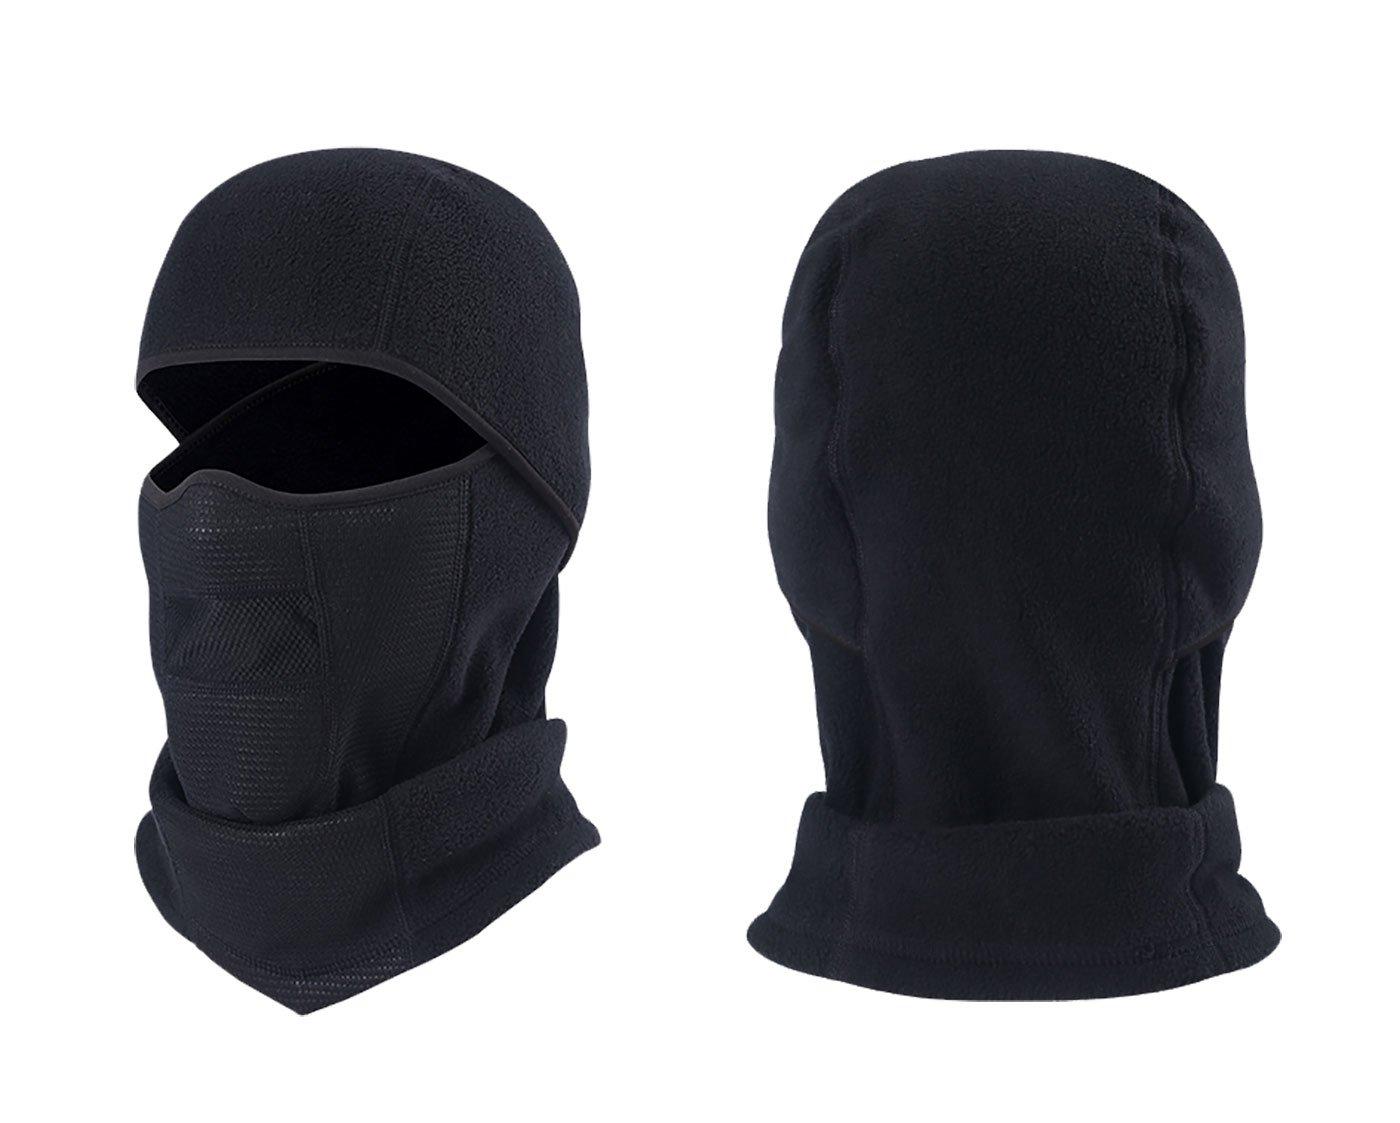 Panegy Funktions Sturmhaube Balaclava Skimaske Motorradmaske Fahrrad Maske Outdoor Sport Gesichtshaube Kopfhaube Schwarz 45*28cm